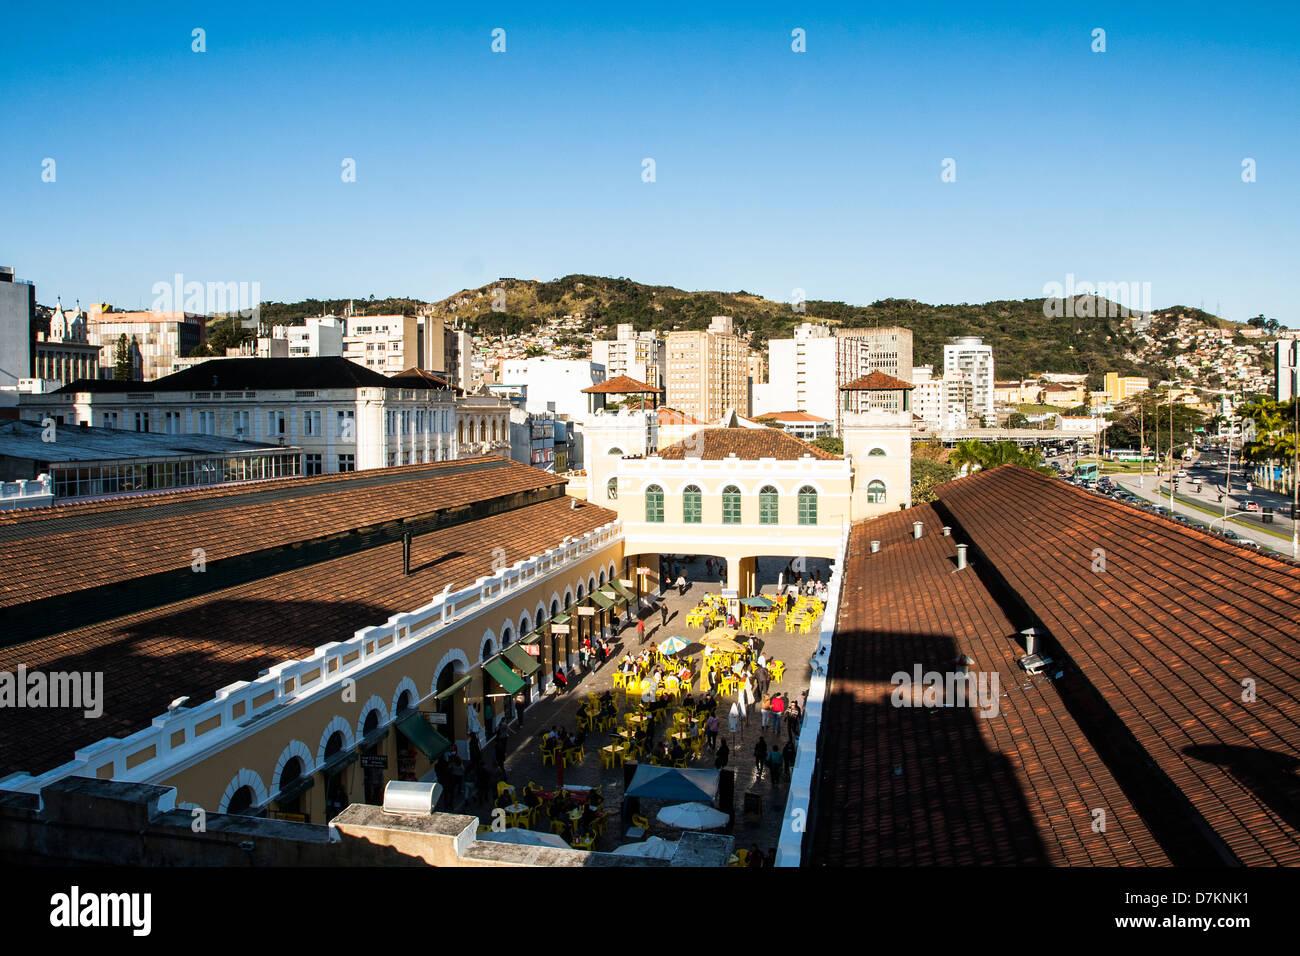 Municipal Public Market of Florianopolis. - Stock Image